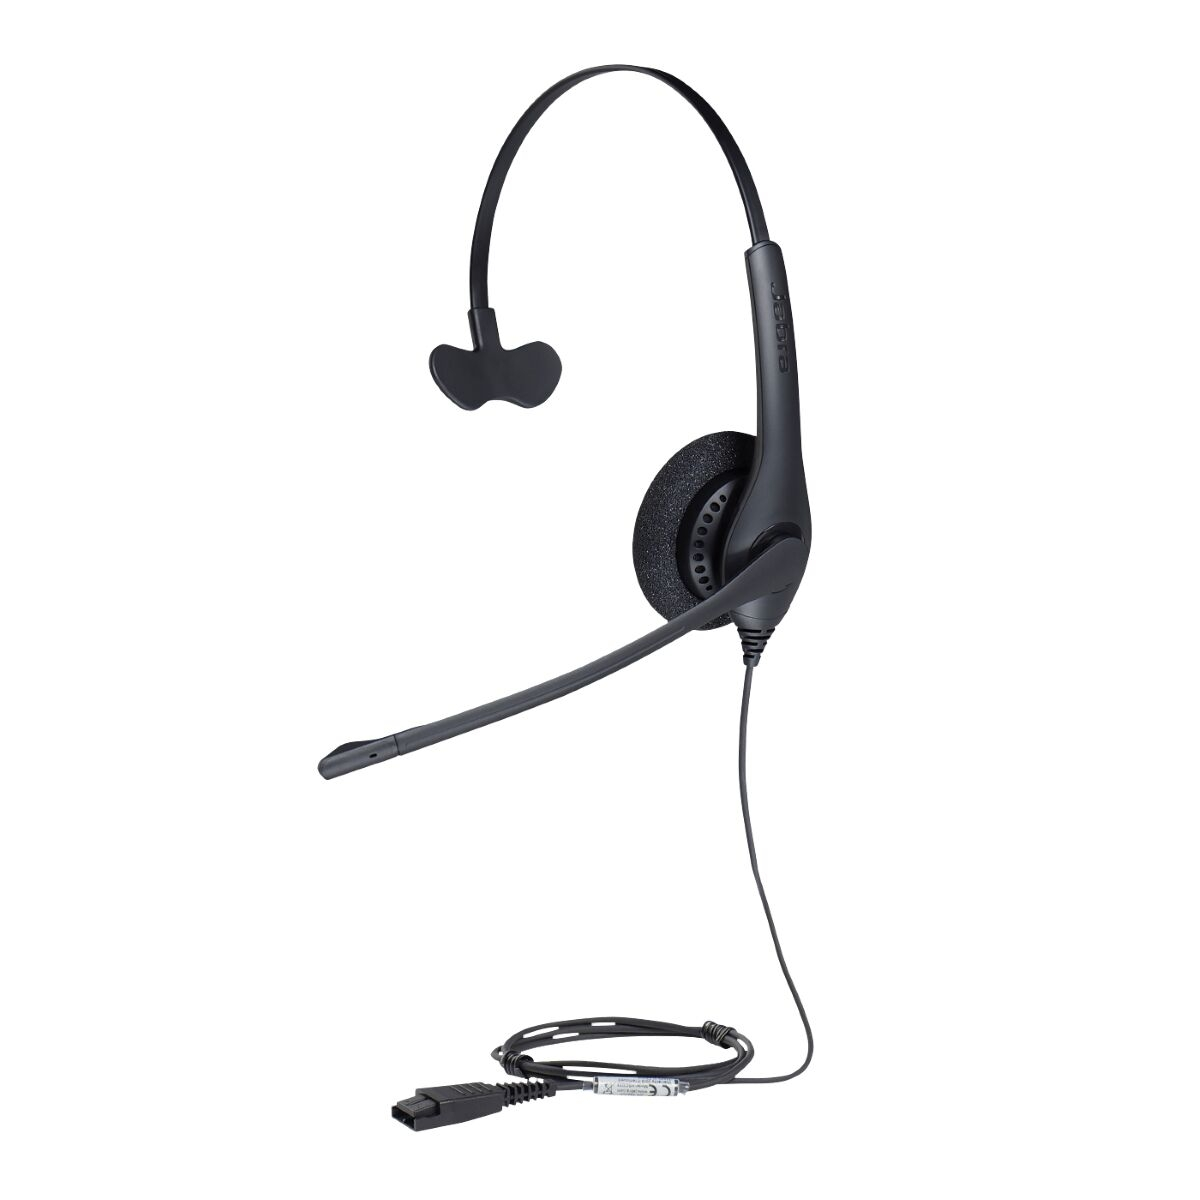 BIZ 1500 Mono, Headset